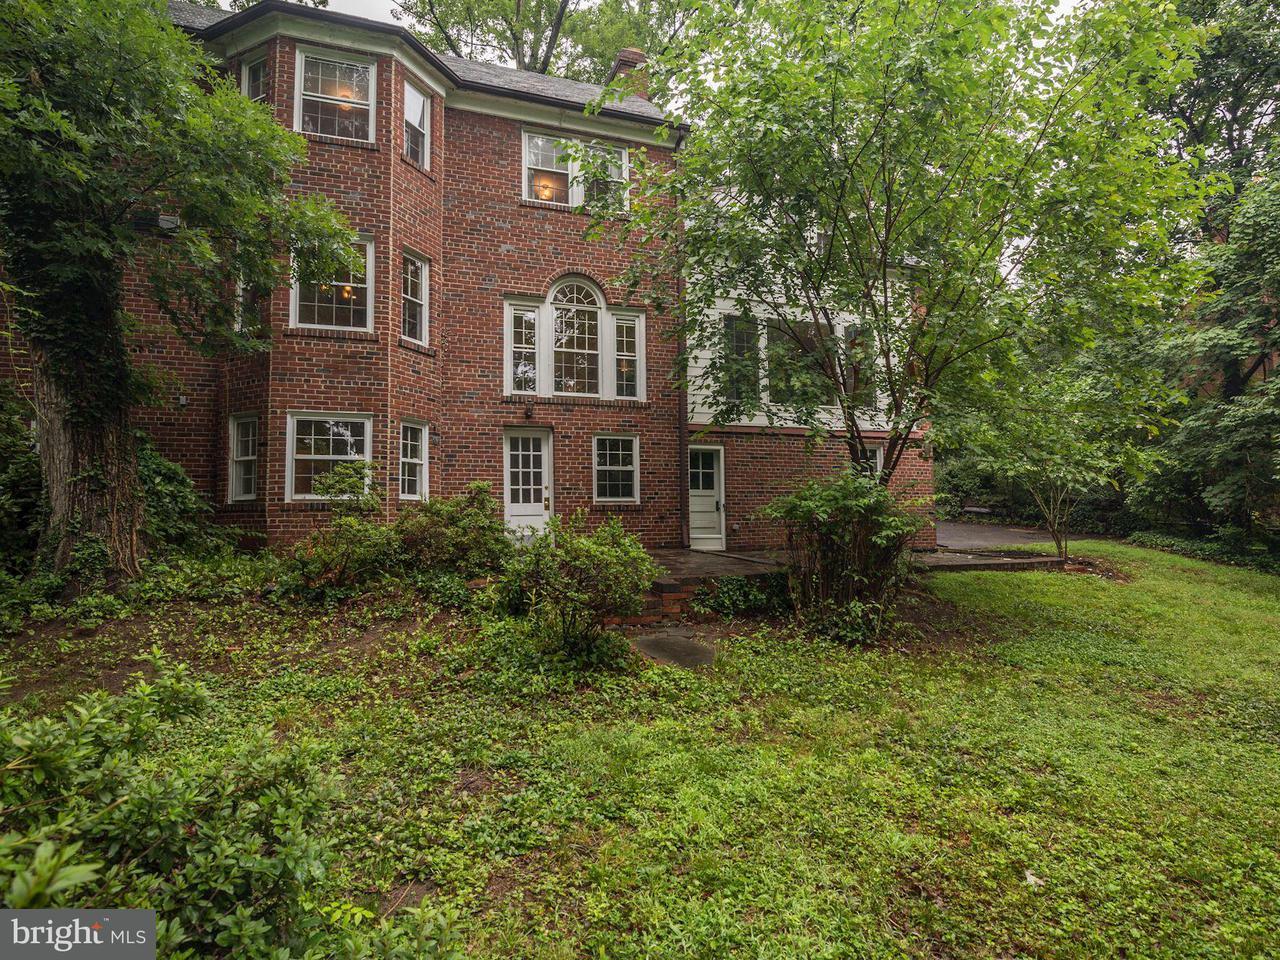 Additional photo for property listing at 3909 CALVERTON Drive 3909 CALVERTON Drive Hyattsville, Μεριλαντ 20782 Ηνωμενεσ Πολιτειεσ